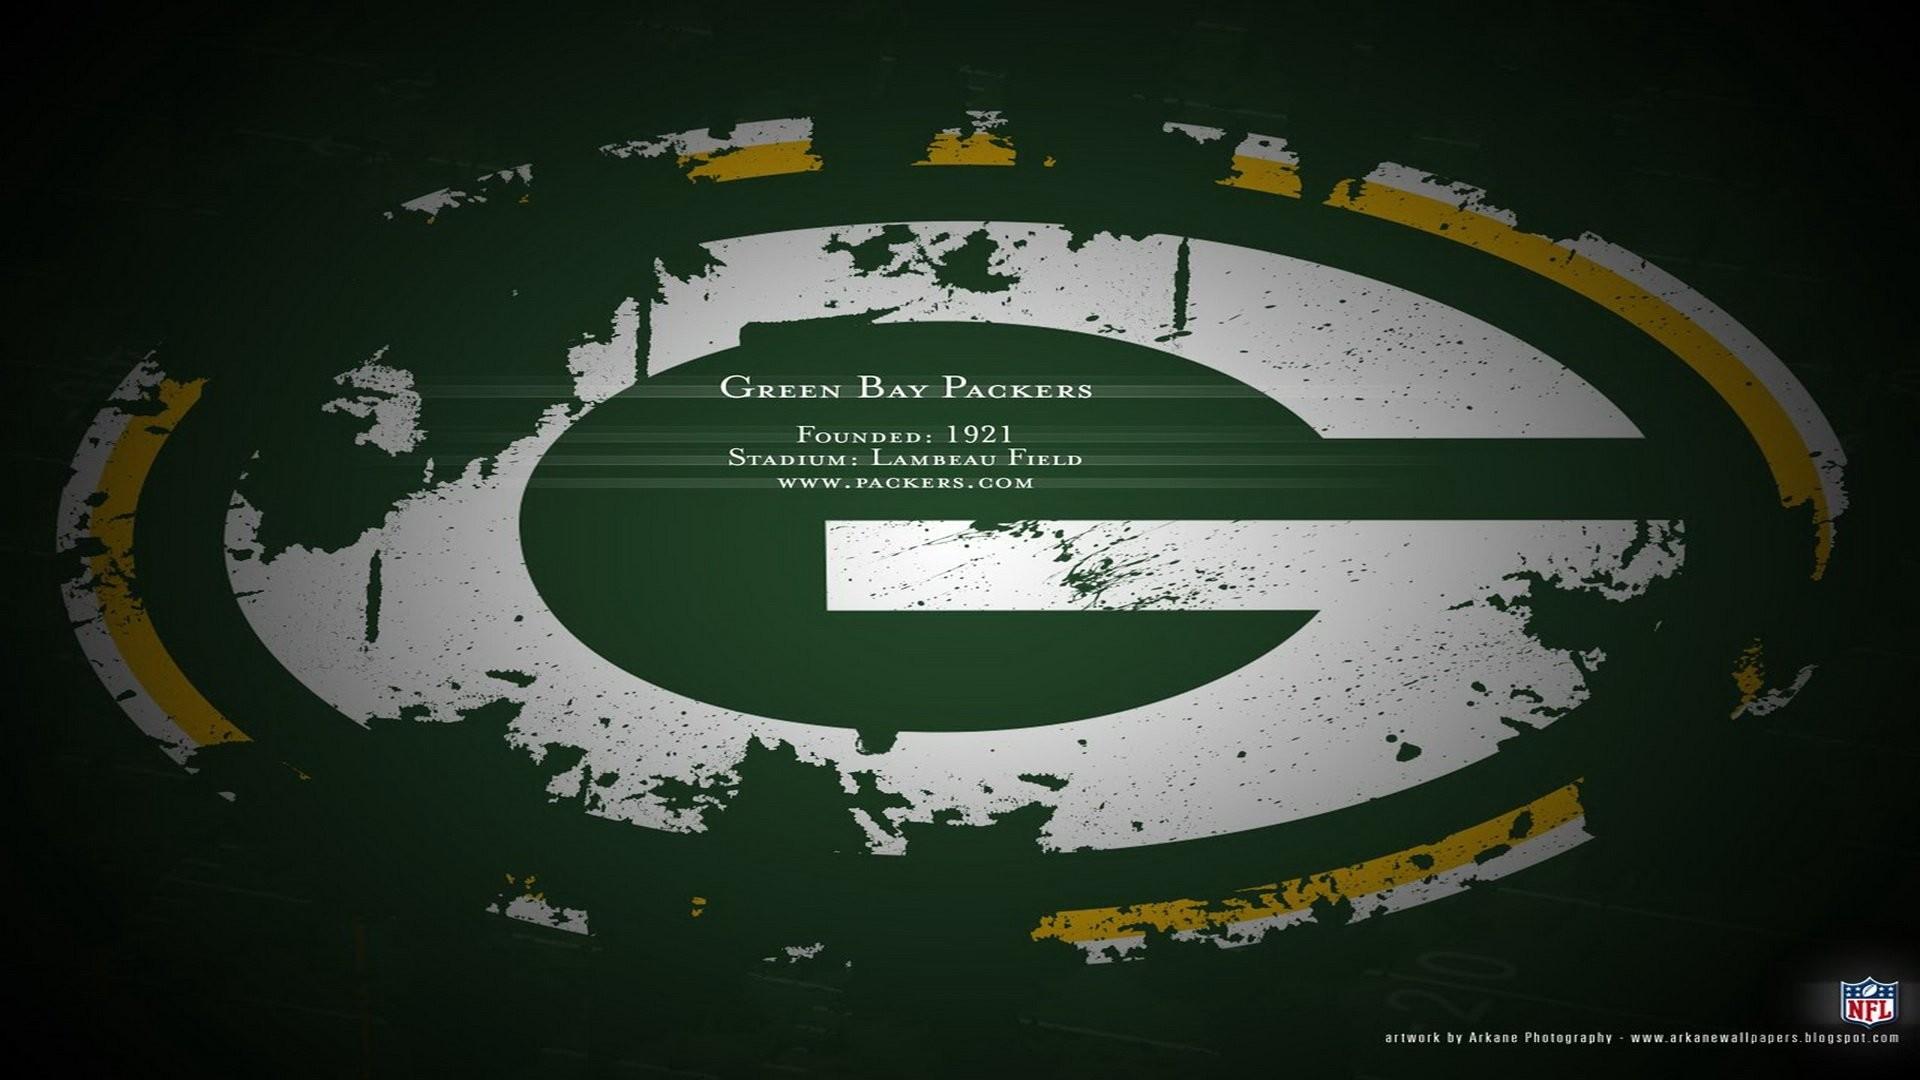 1920x1200 Green Bay Packers Schedule